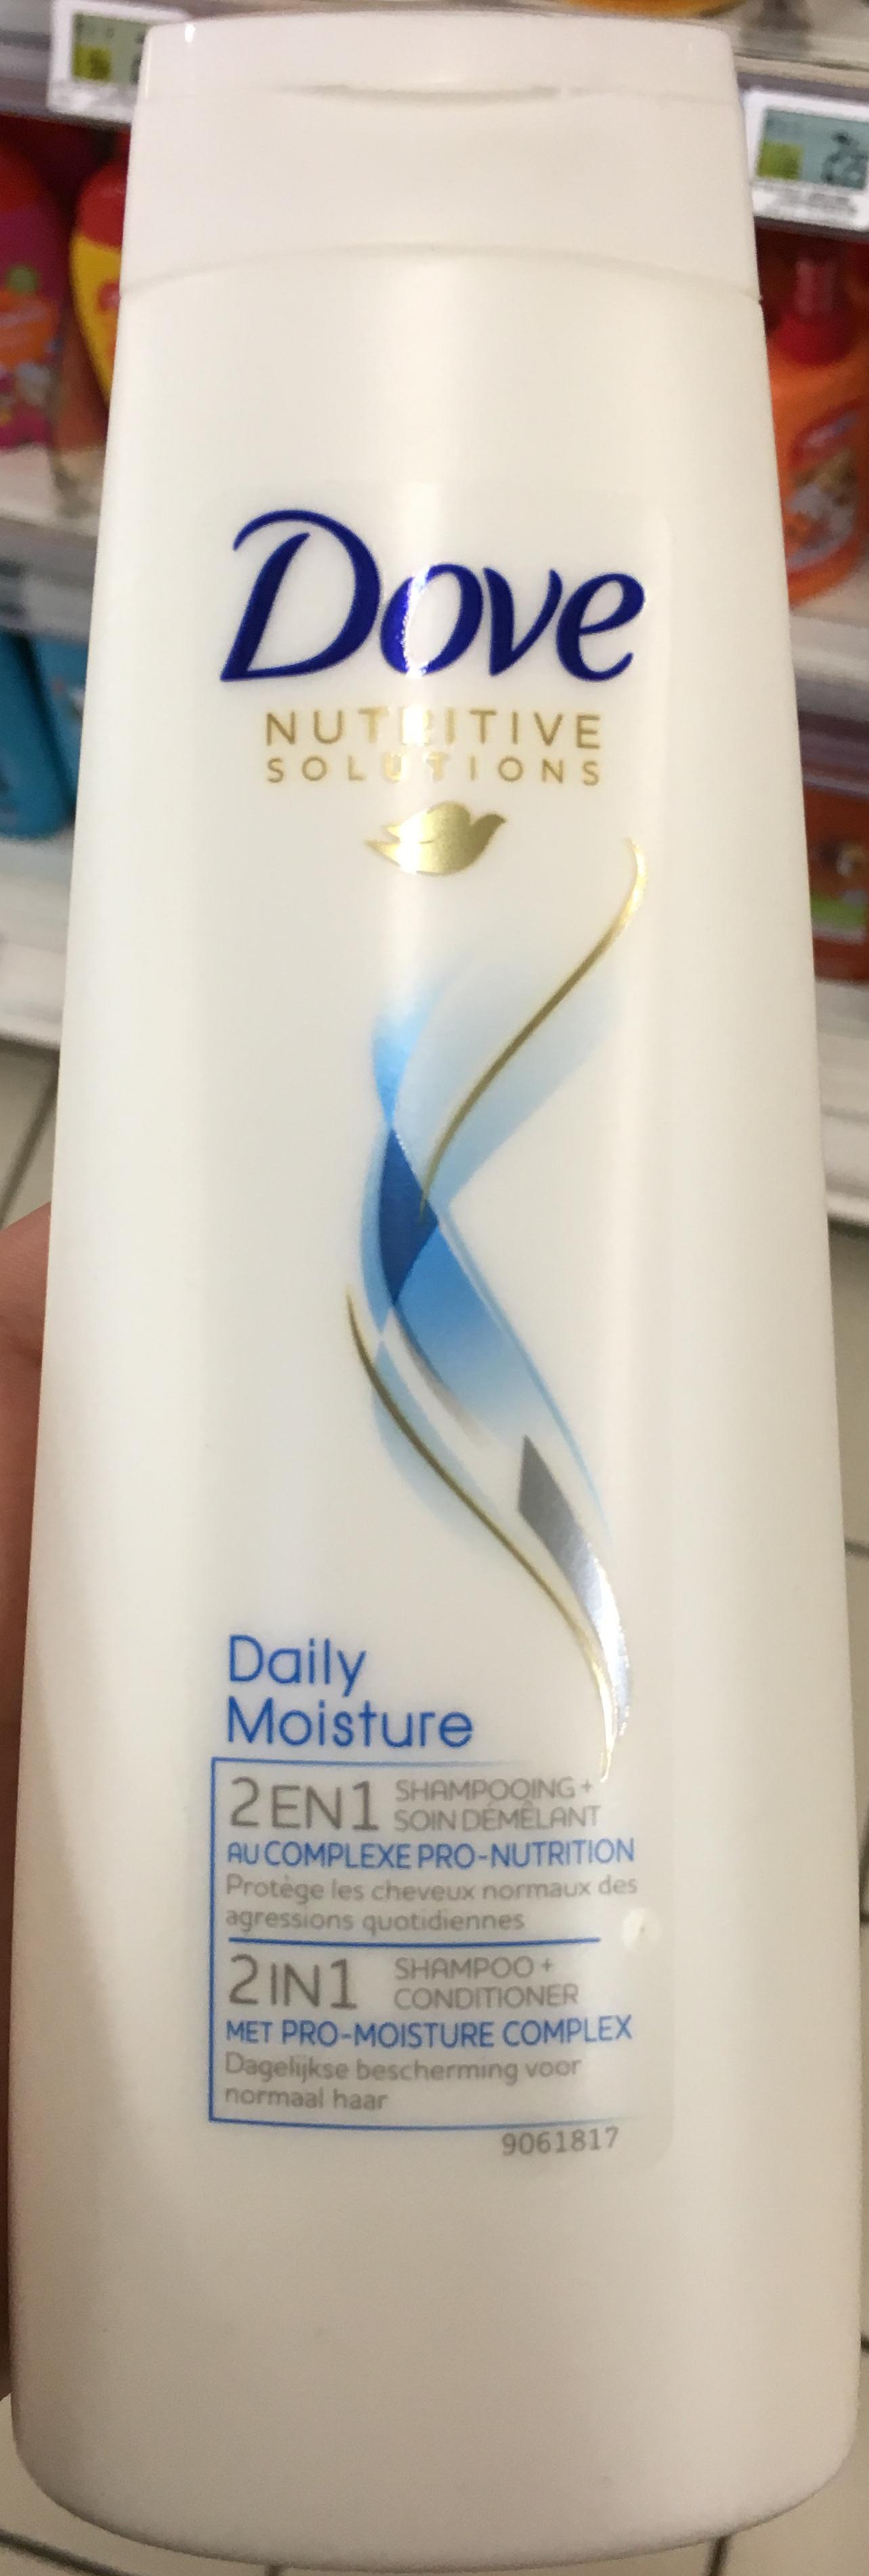 Nutritive Solutions Daily Moisture 2 en 1 Shampooing + Soin démêlant - Product - fr